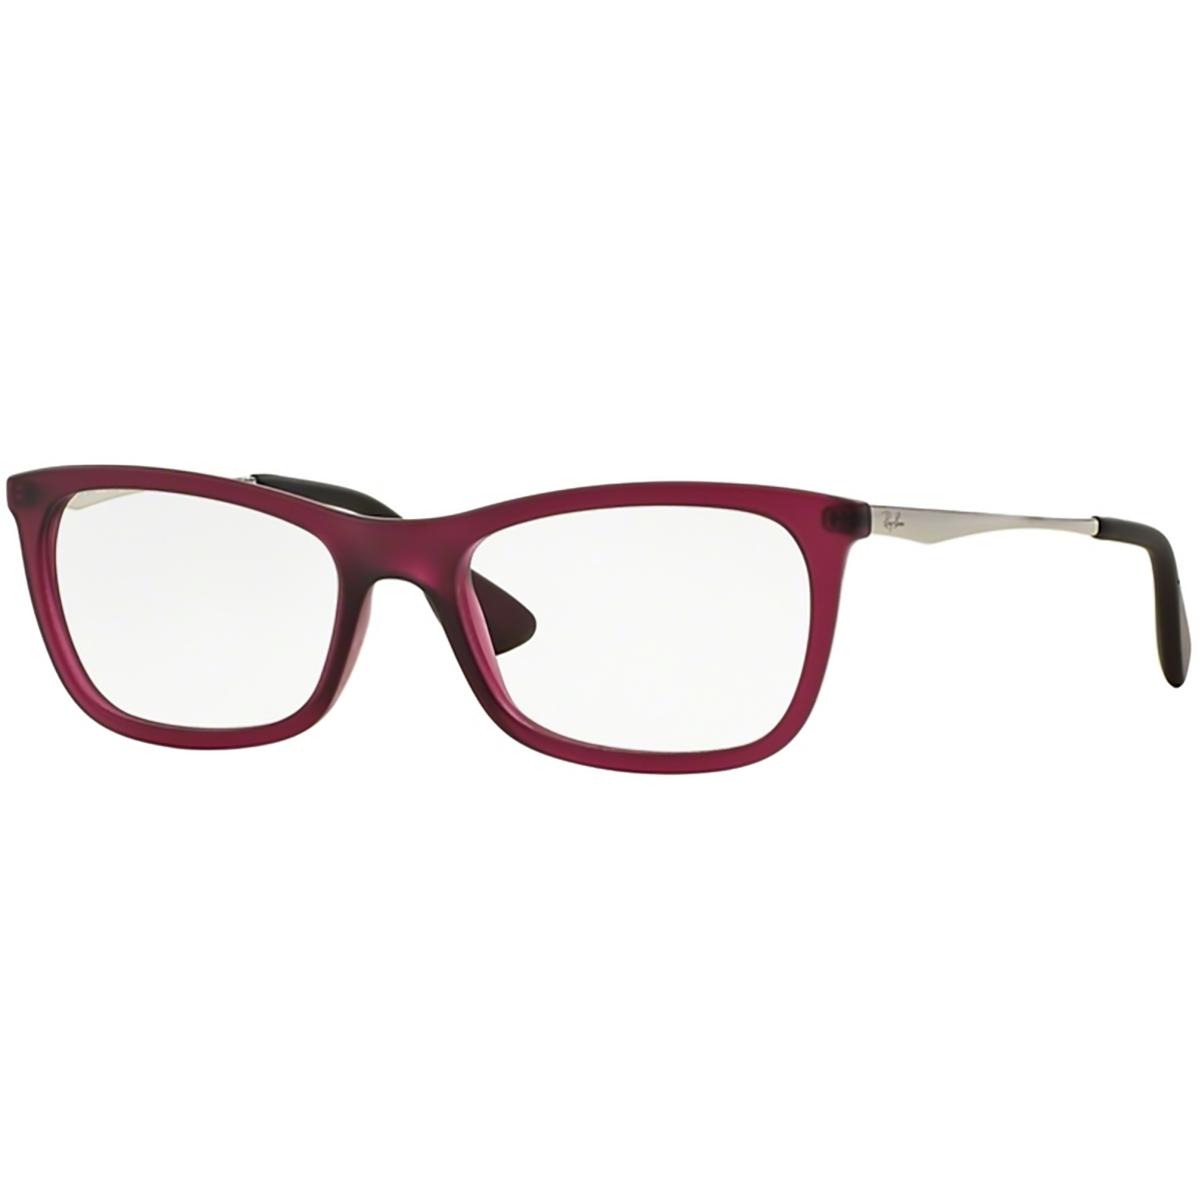 db7ef8332 Compre Óculos de Grau Ray Ban em 10X | Tri-Jóia Shop